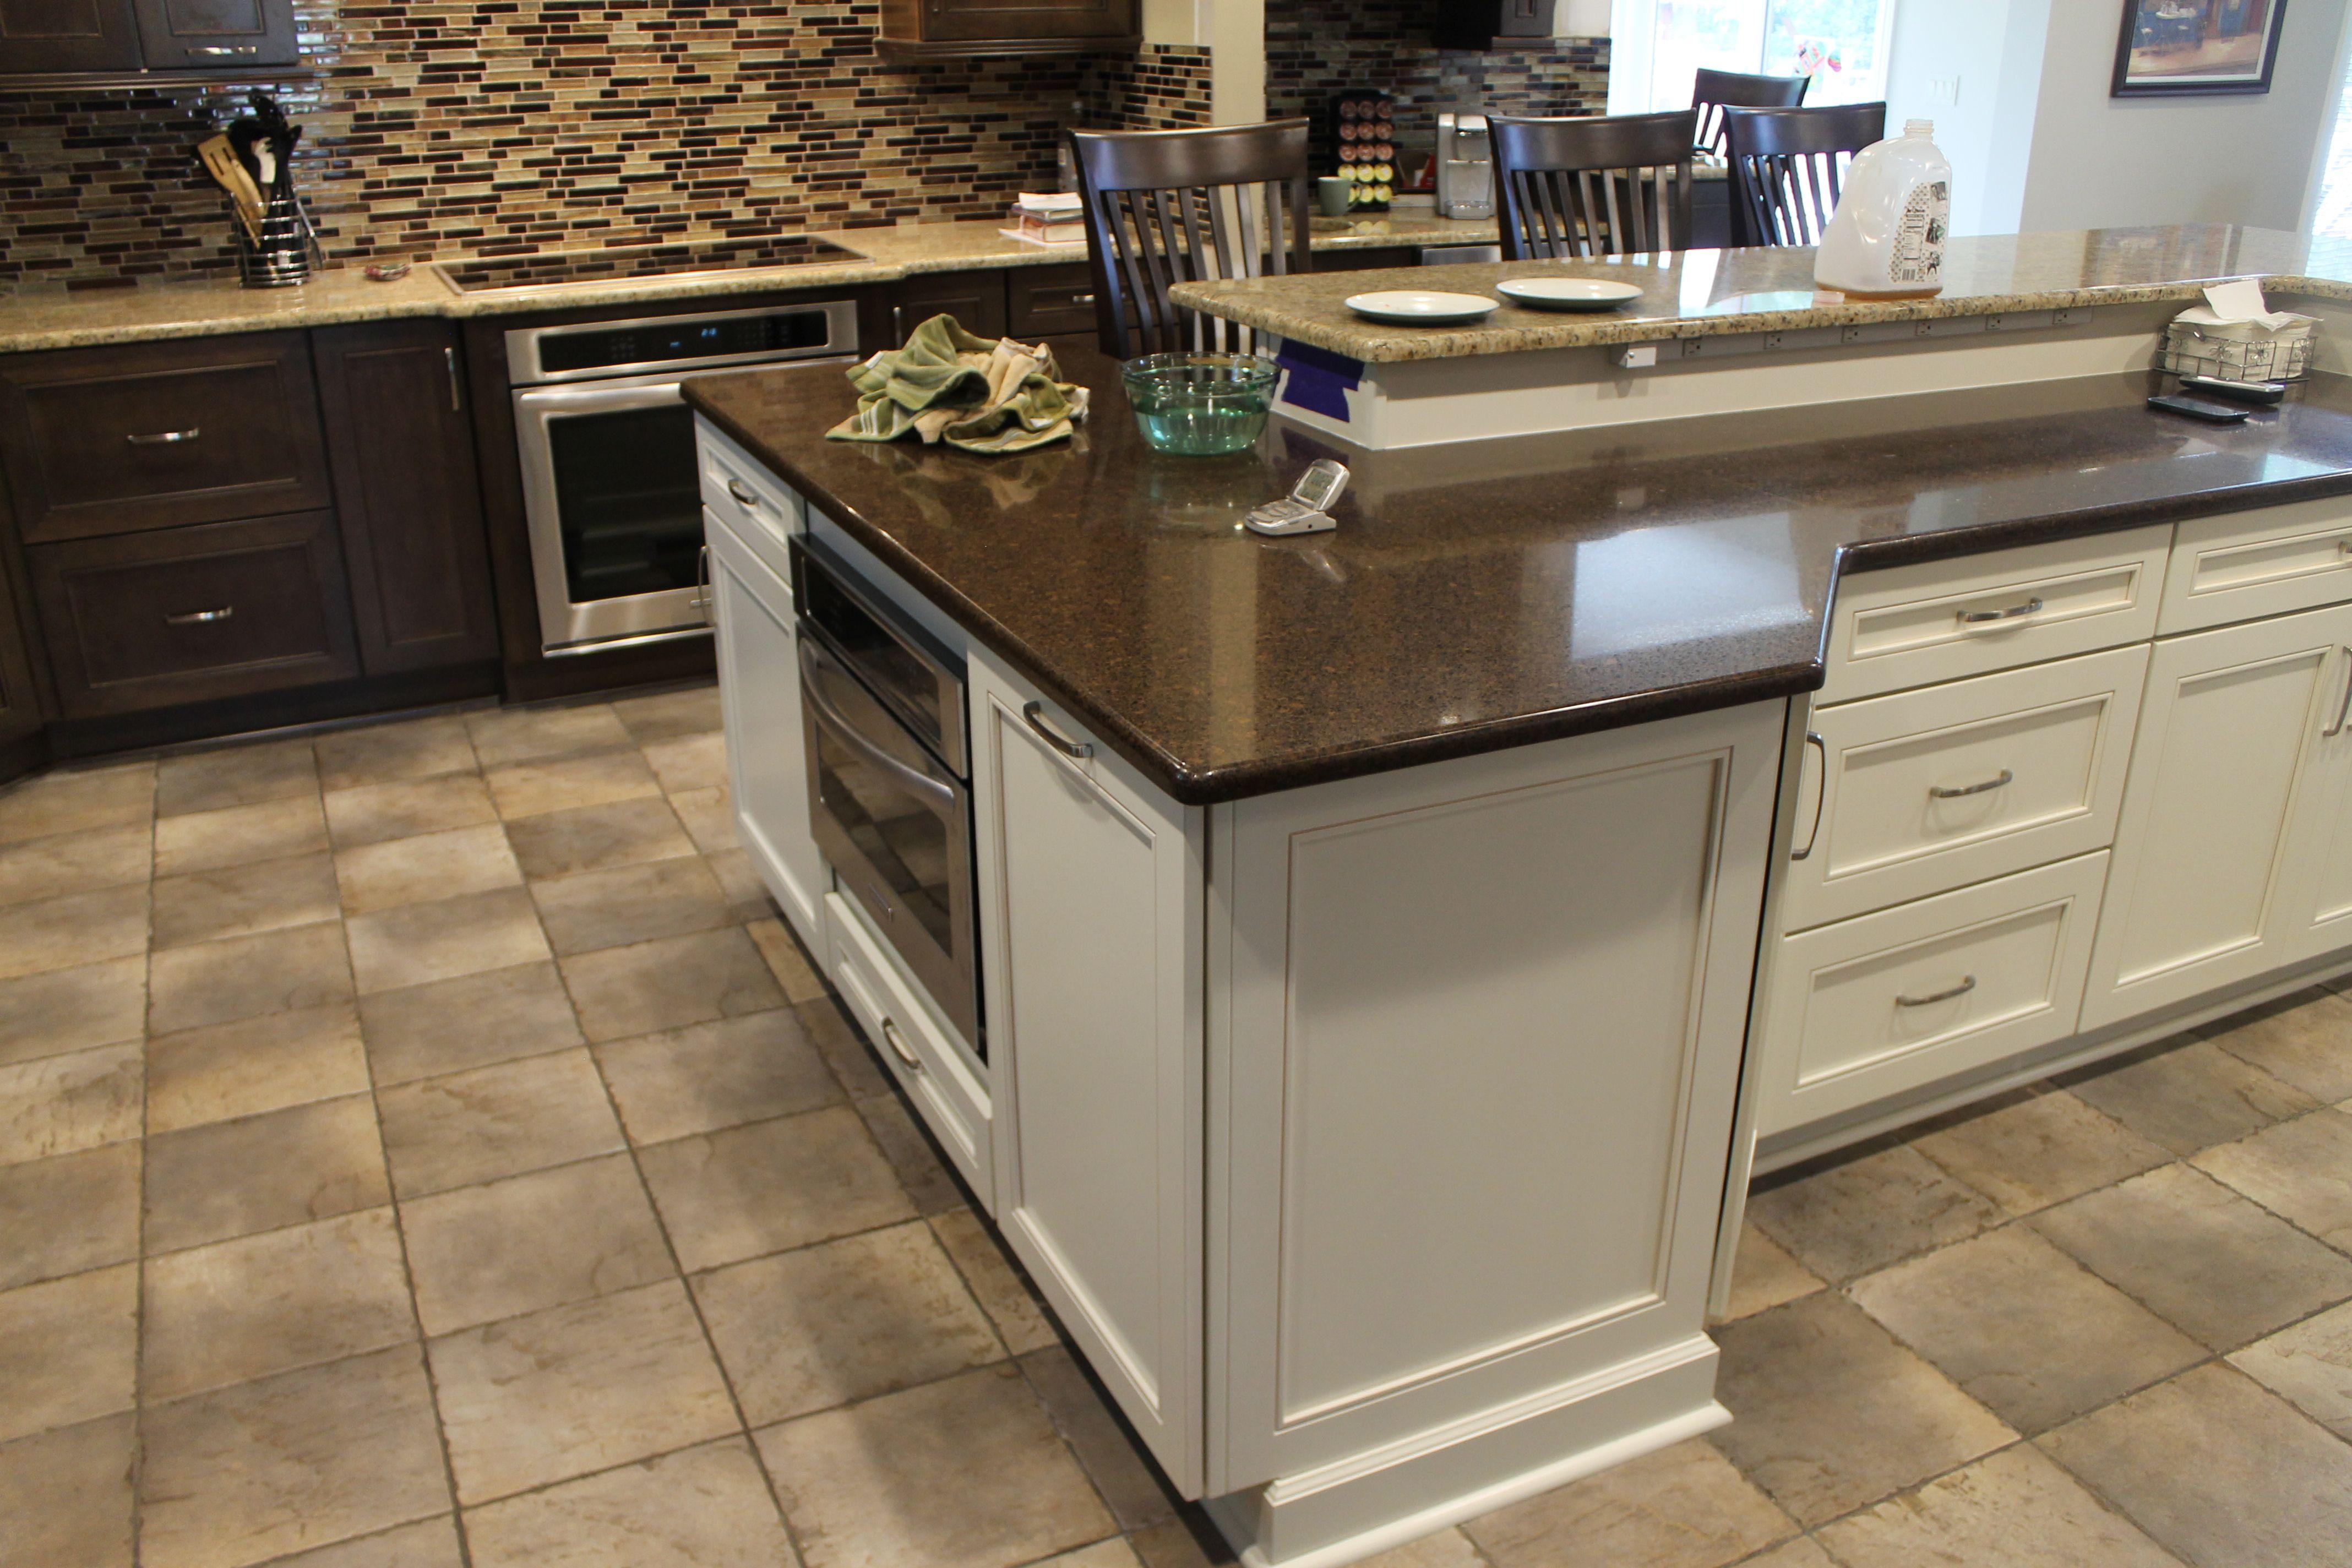 Medium Maple Cabinets with light Granite countertops and ... on Light Maple Cabinets With Black Countertops  id=96307